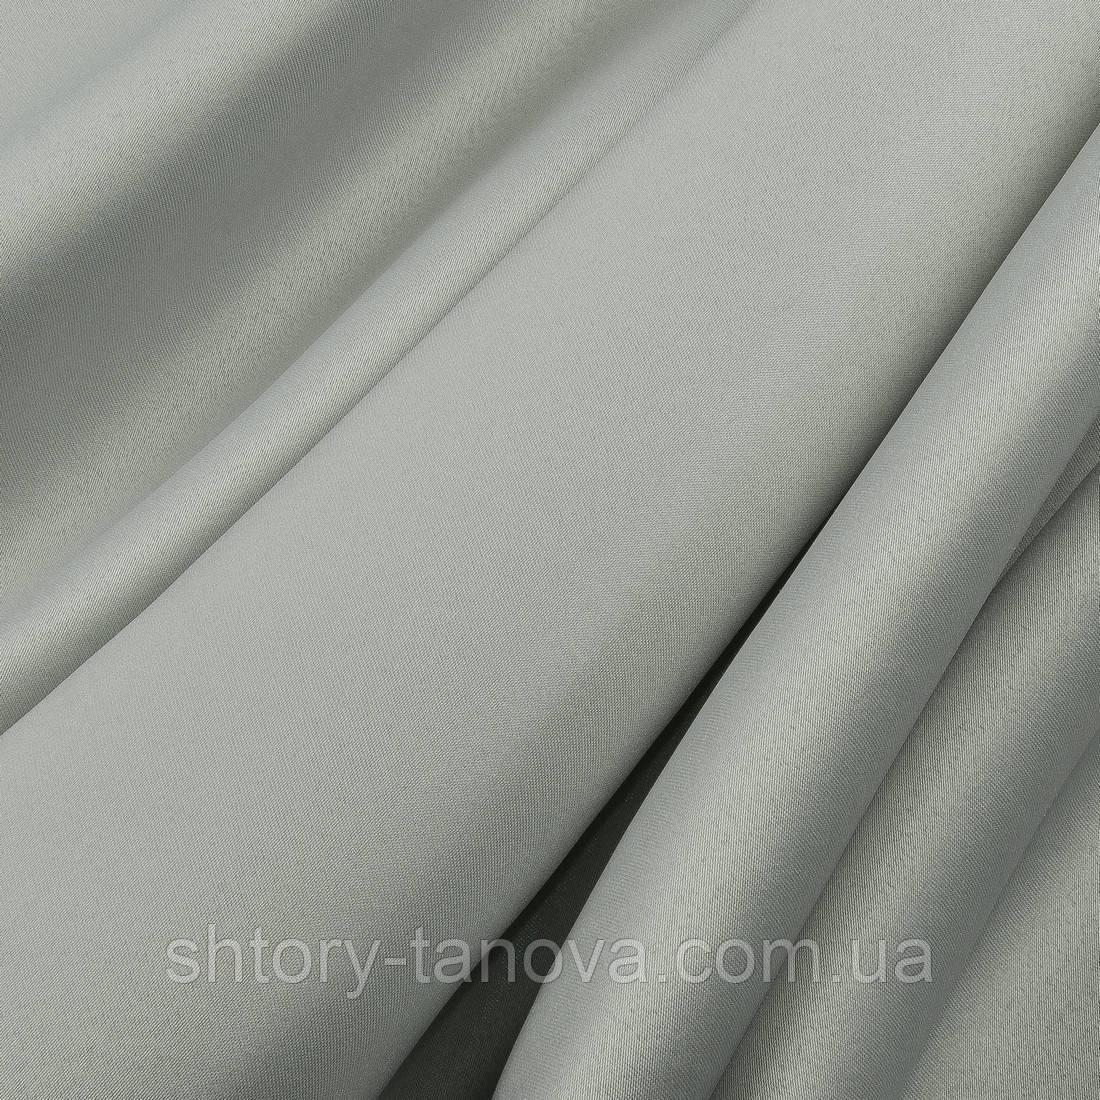 Декоративный атлас дека/ deca серый